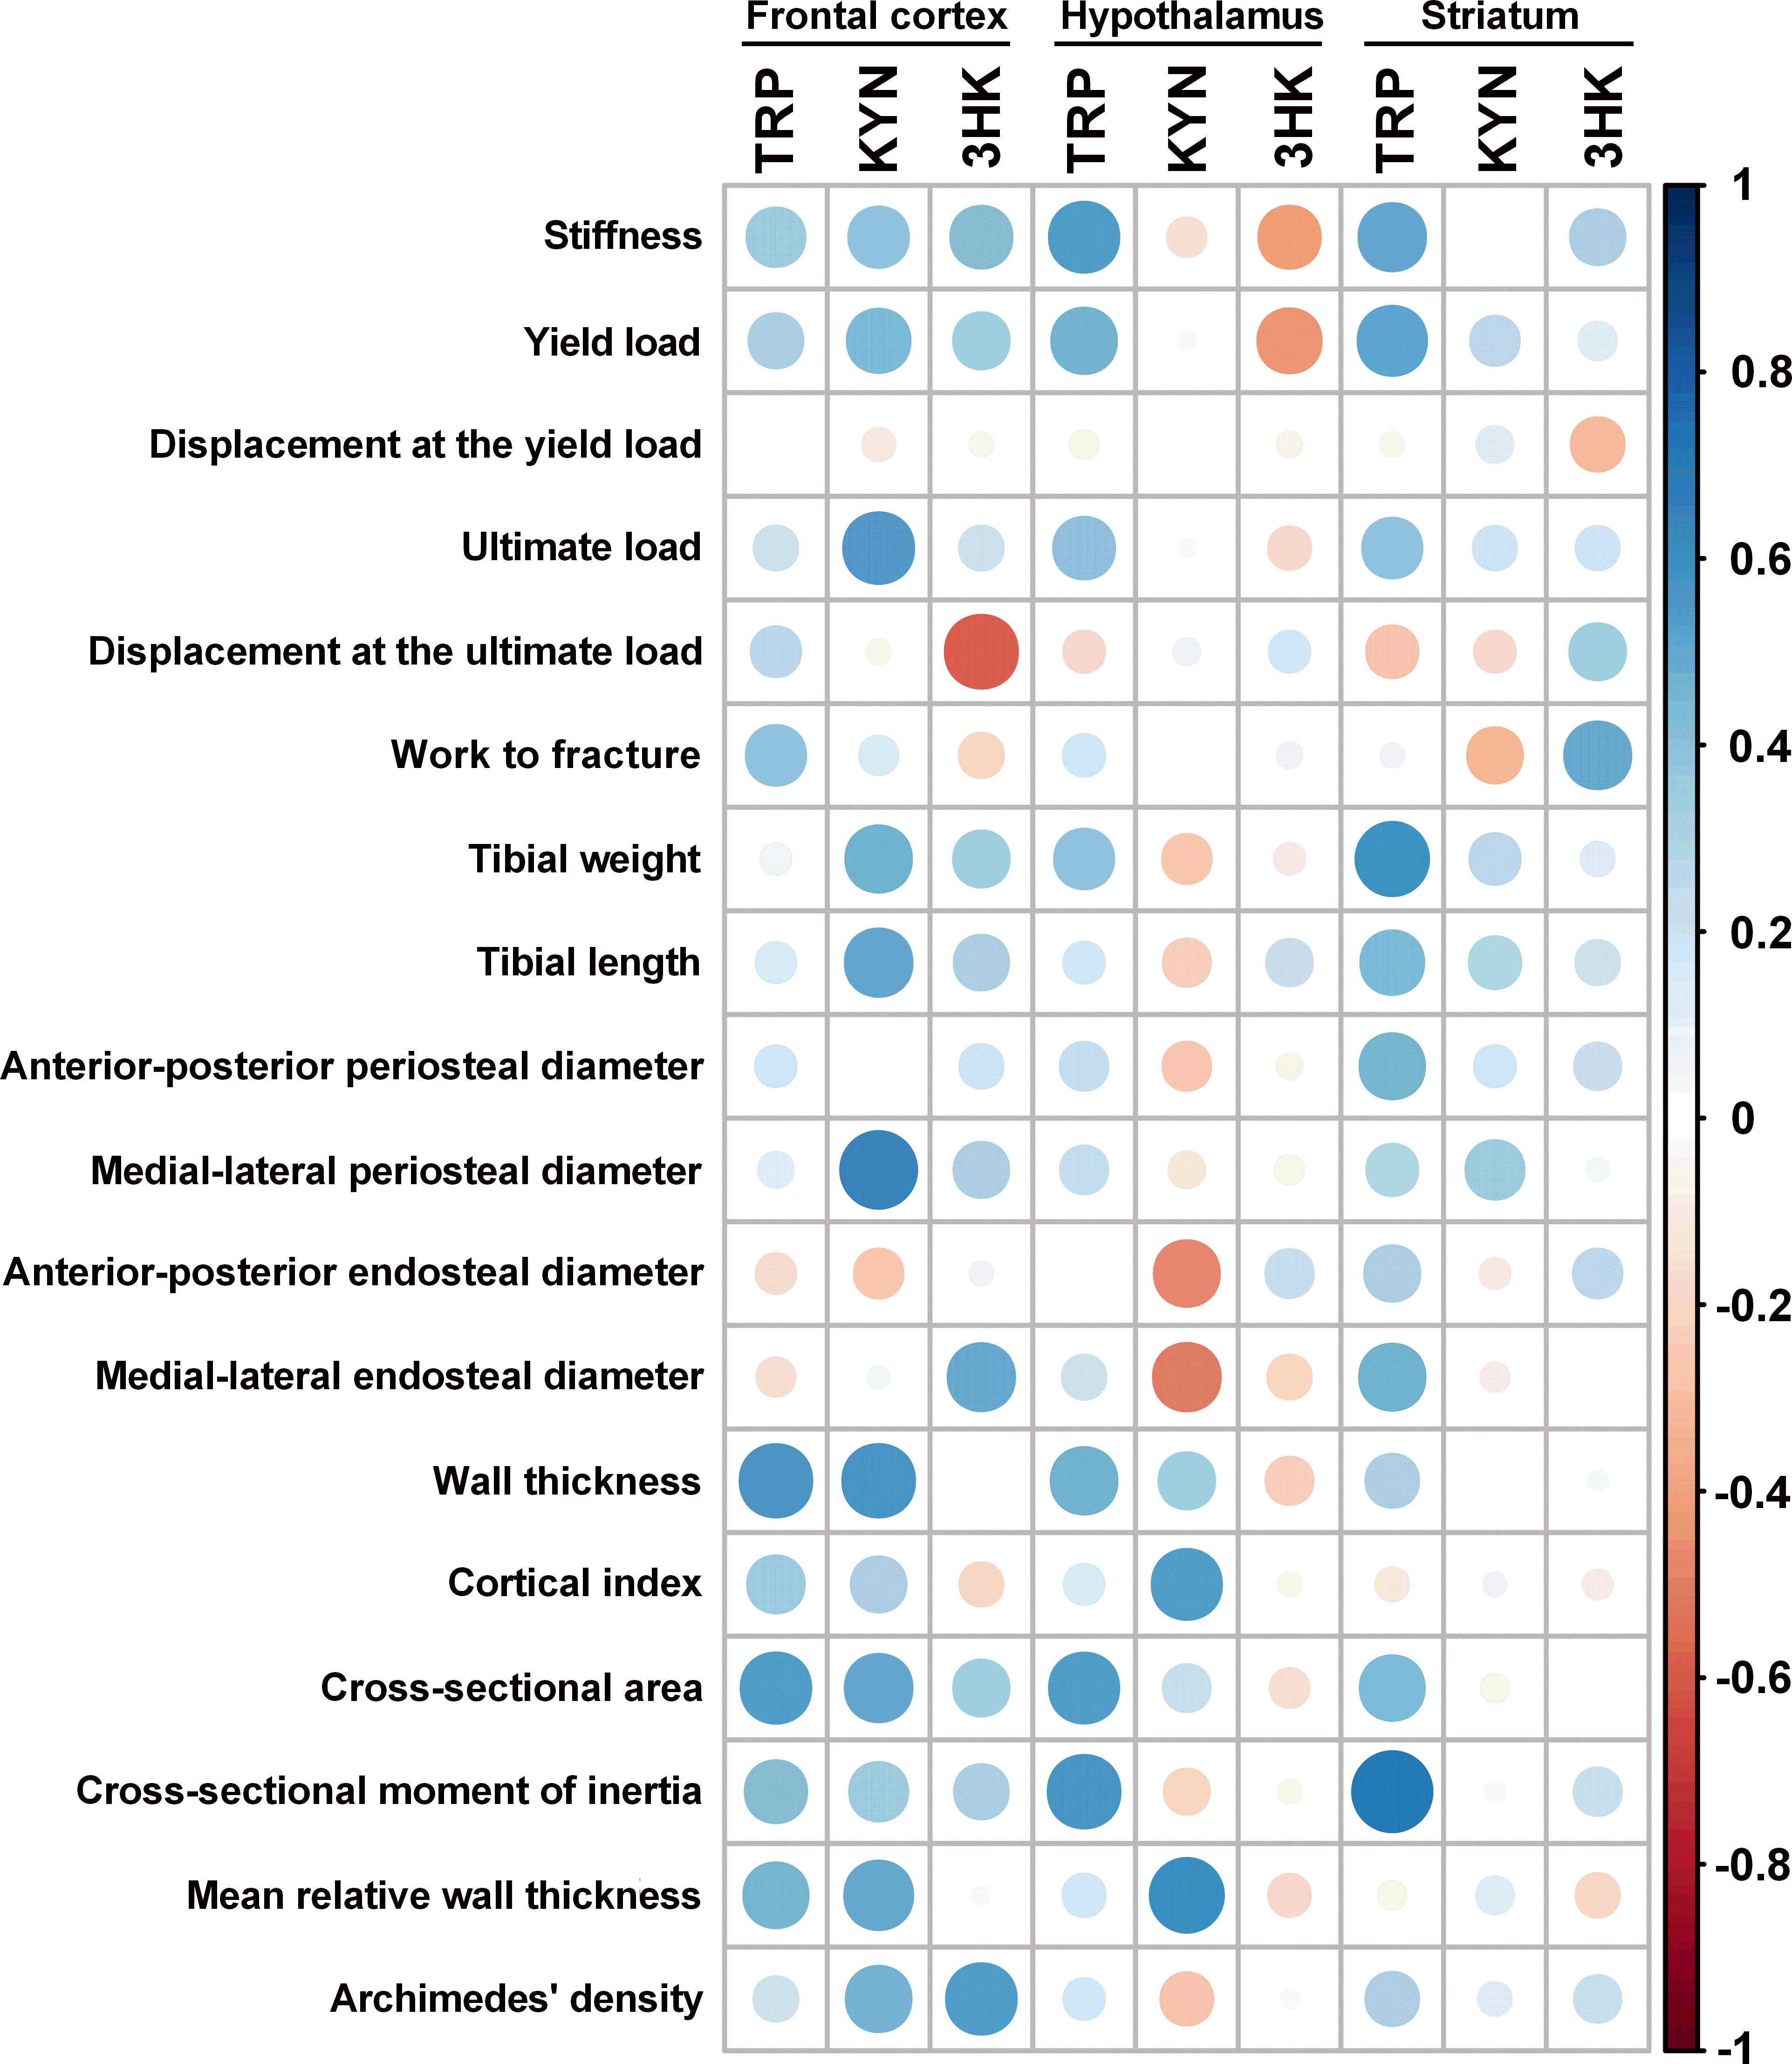 A link between central kynurenine metabolism and bone